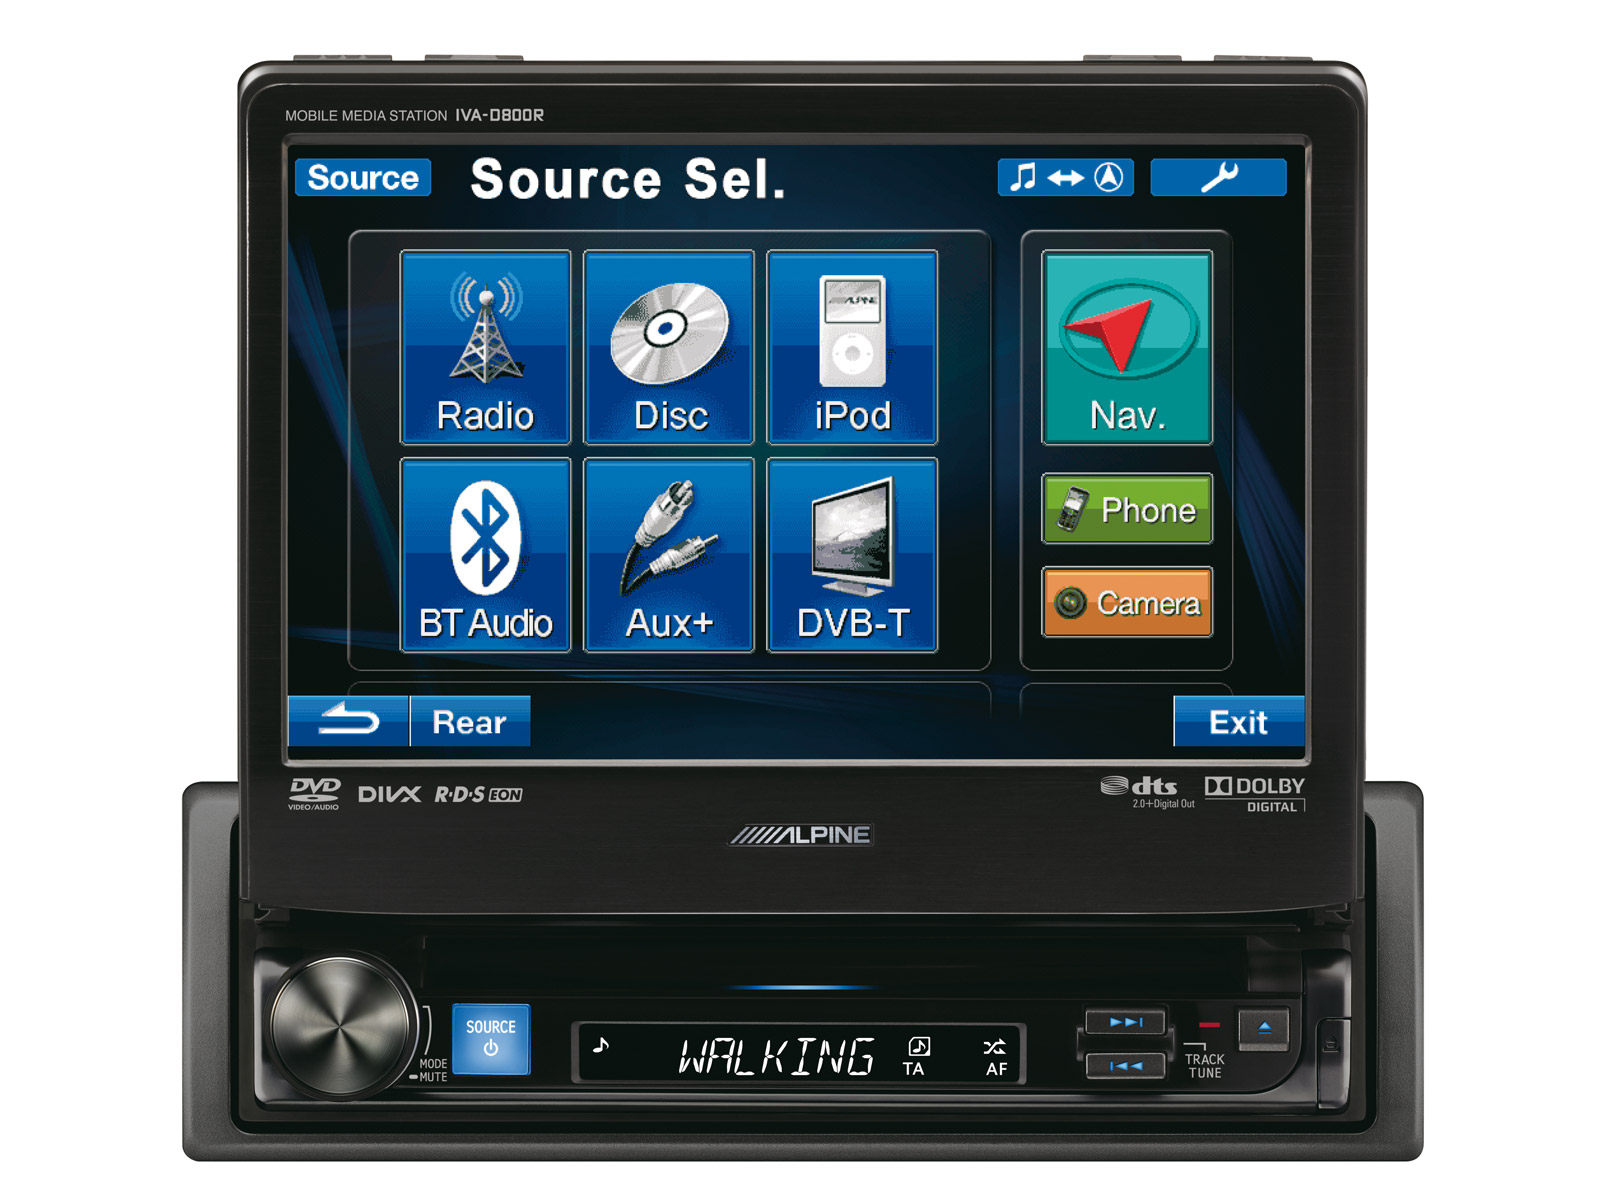 1din Mobile Media Station Alpine Iva D800r Wiring Additionally 10 Inch Subwoofer Type R On